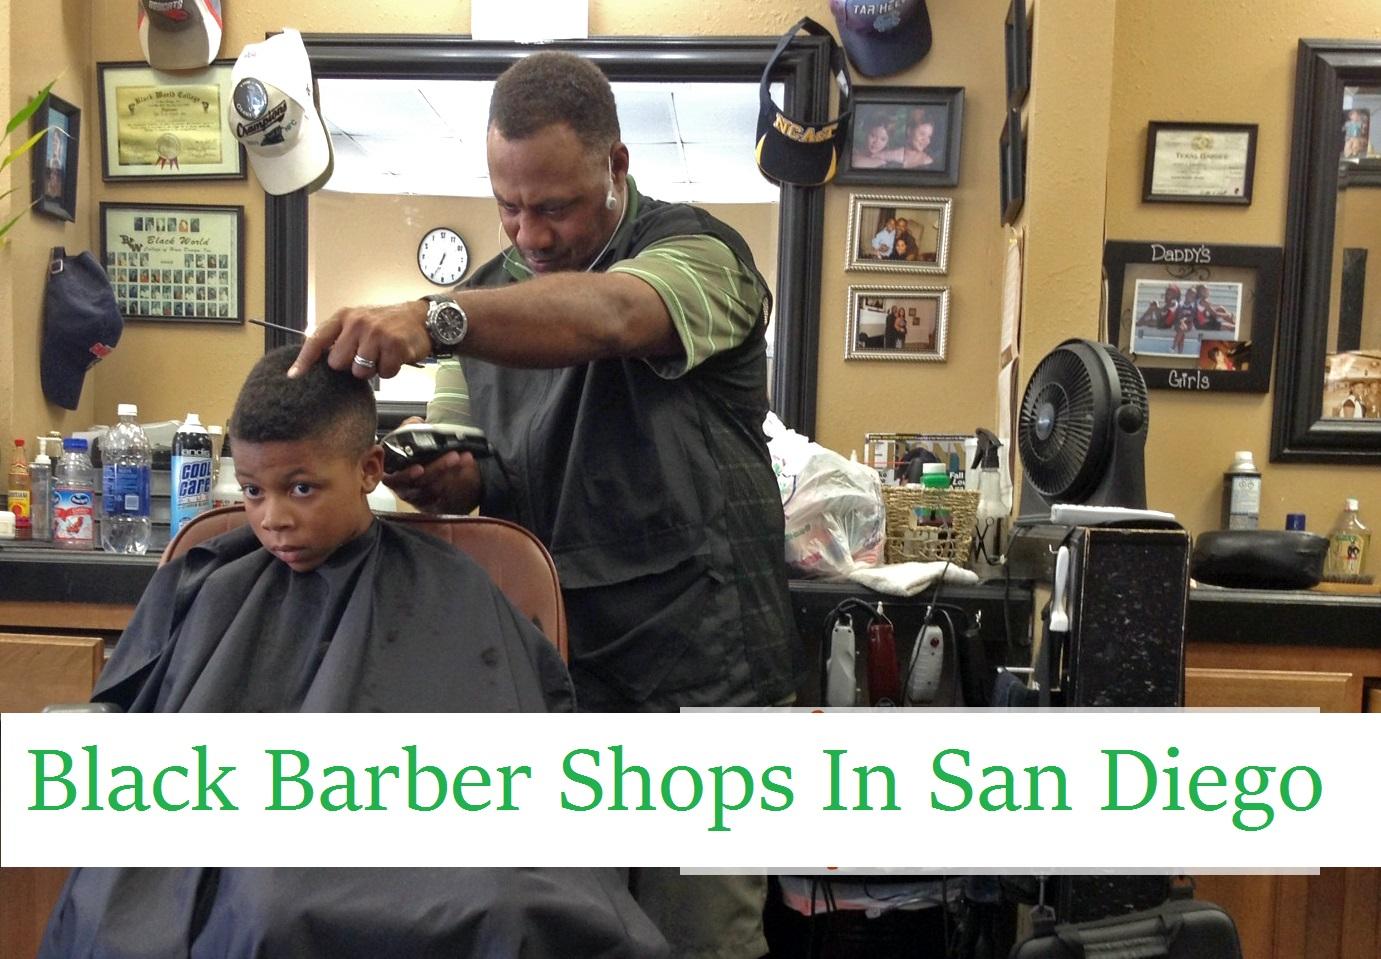 Black Barber Shops In San Diego California Nearest Closest